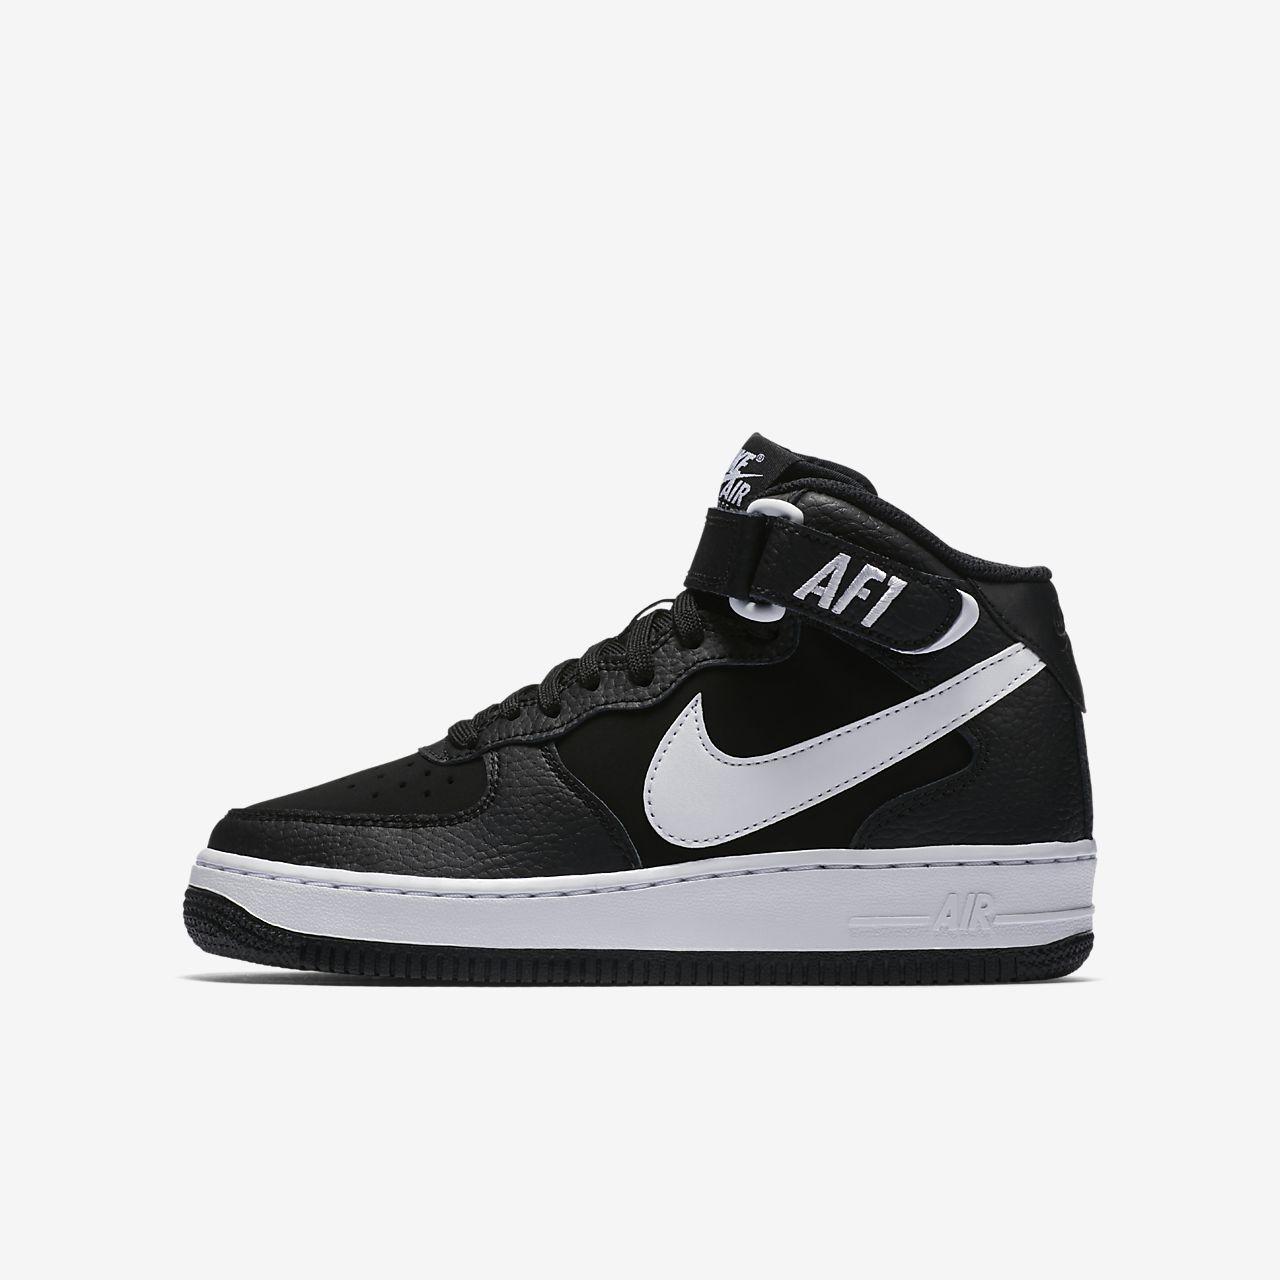 Chaussures Nike Air Force 1 noires garçon NtXk1